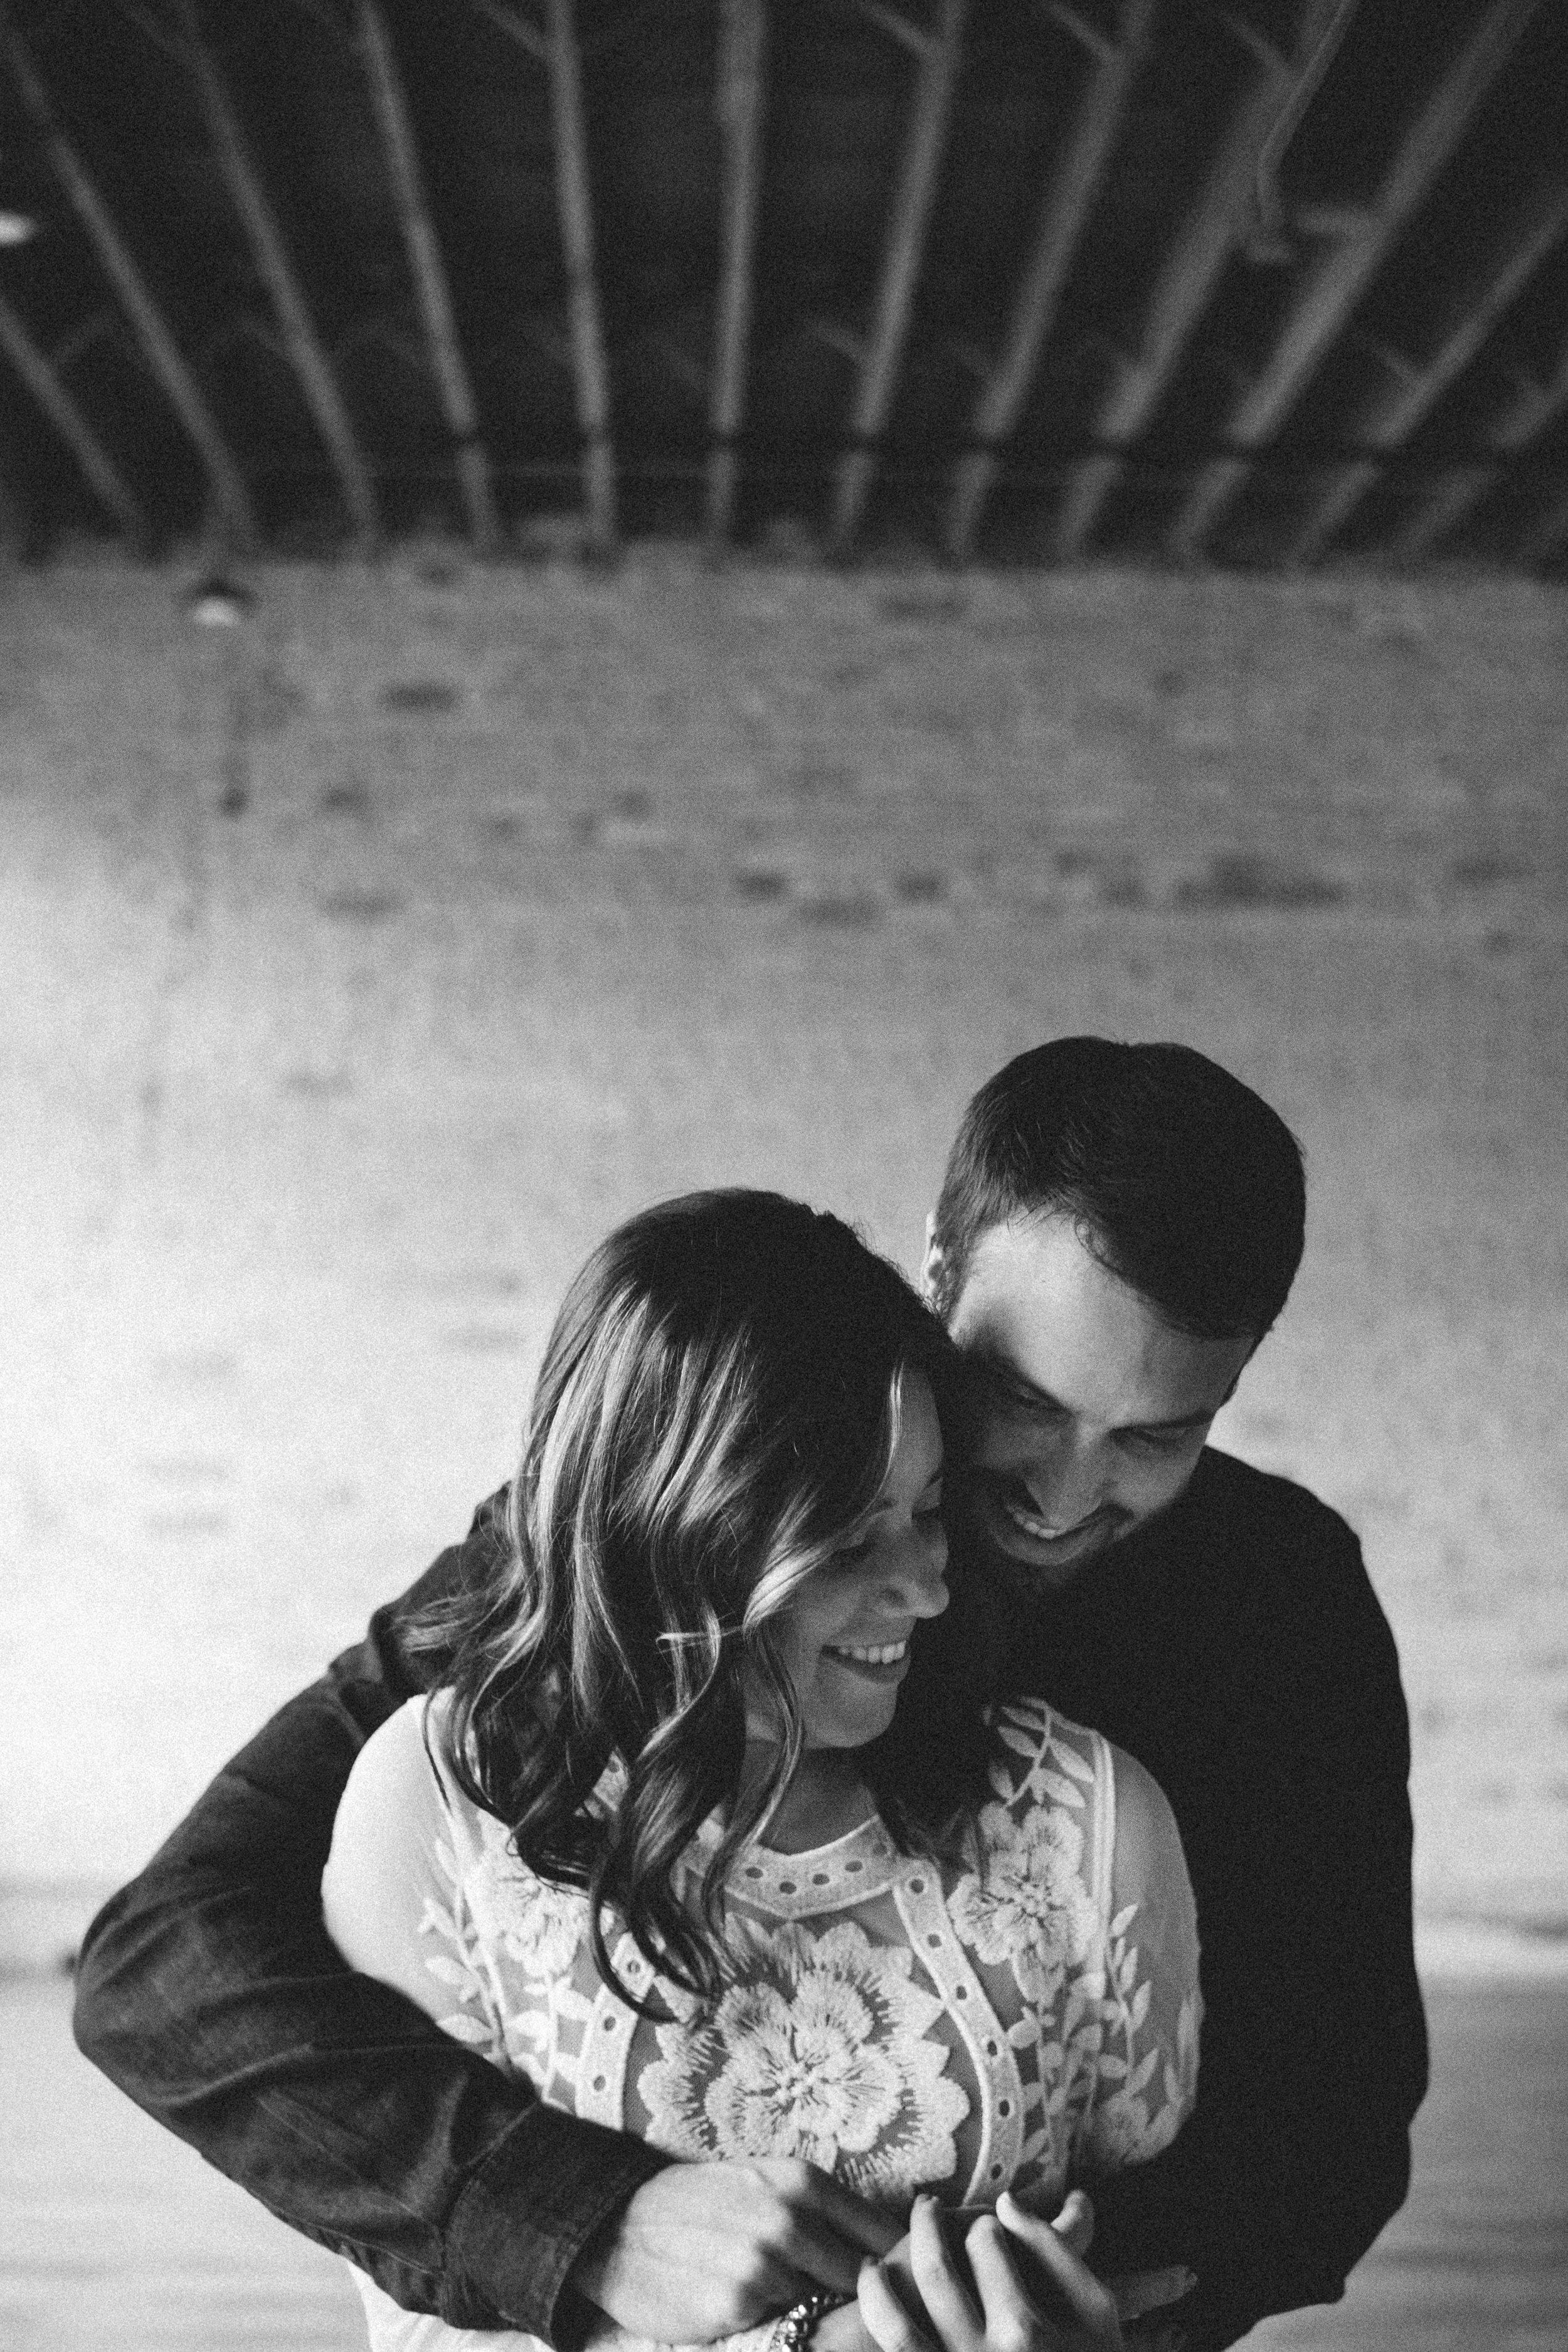 Lauren_Nick_Manzer_Bailey_Engagement_Photos_0059.jpg